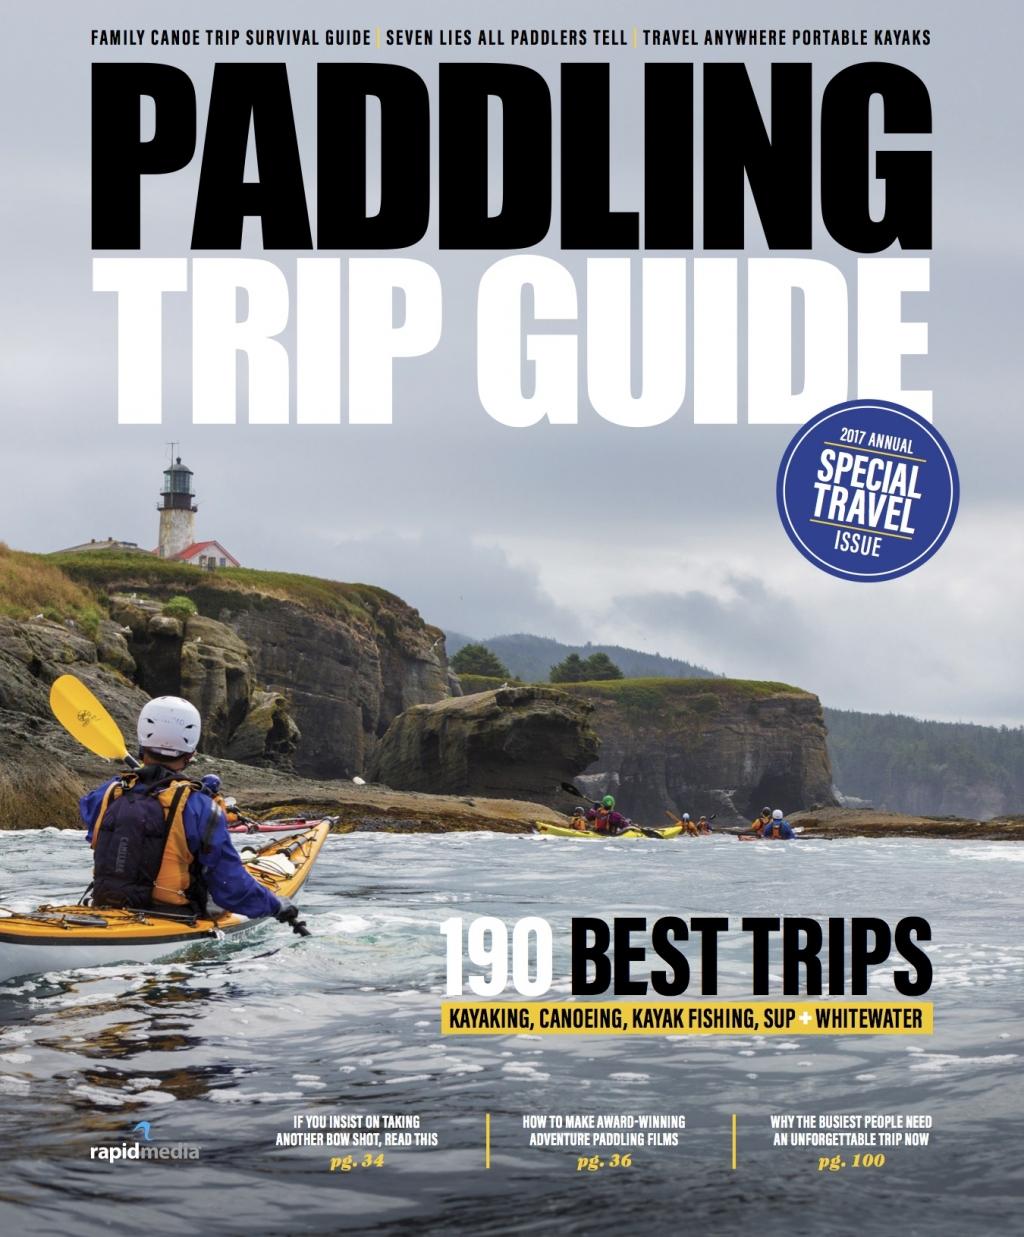 Print and Paddlesports